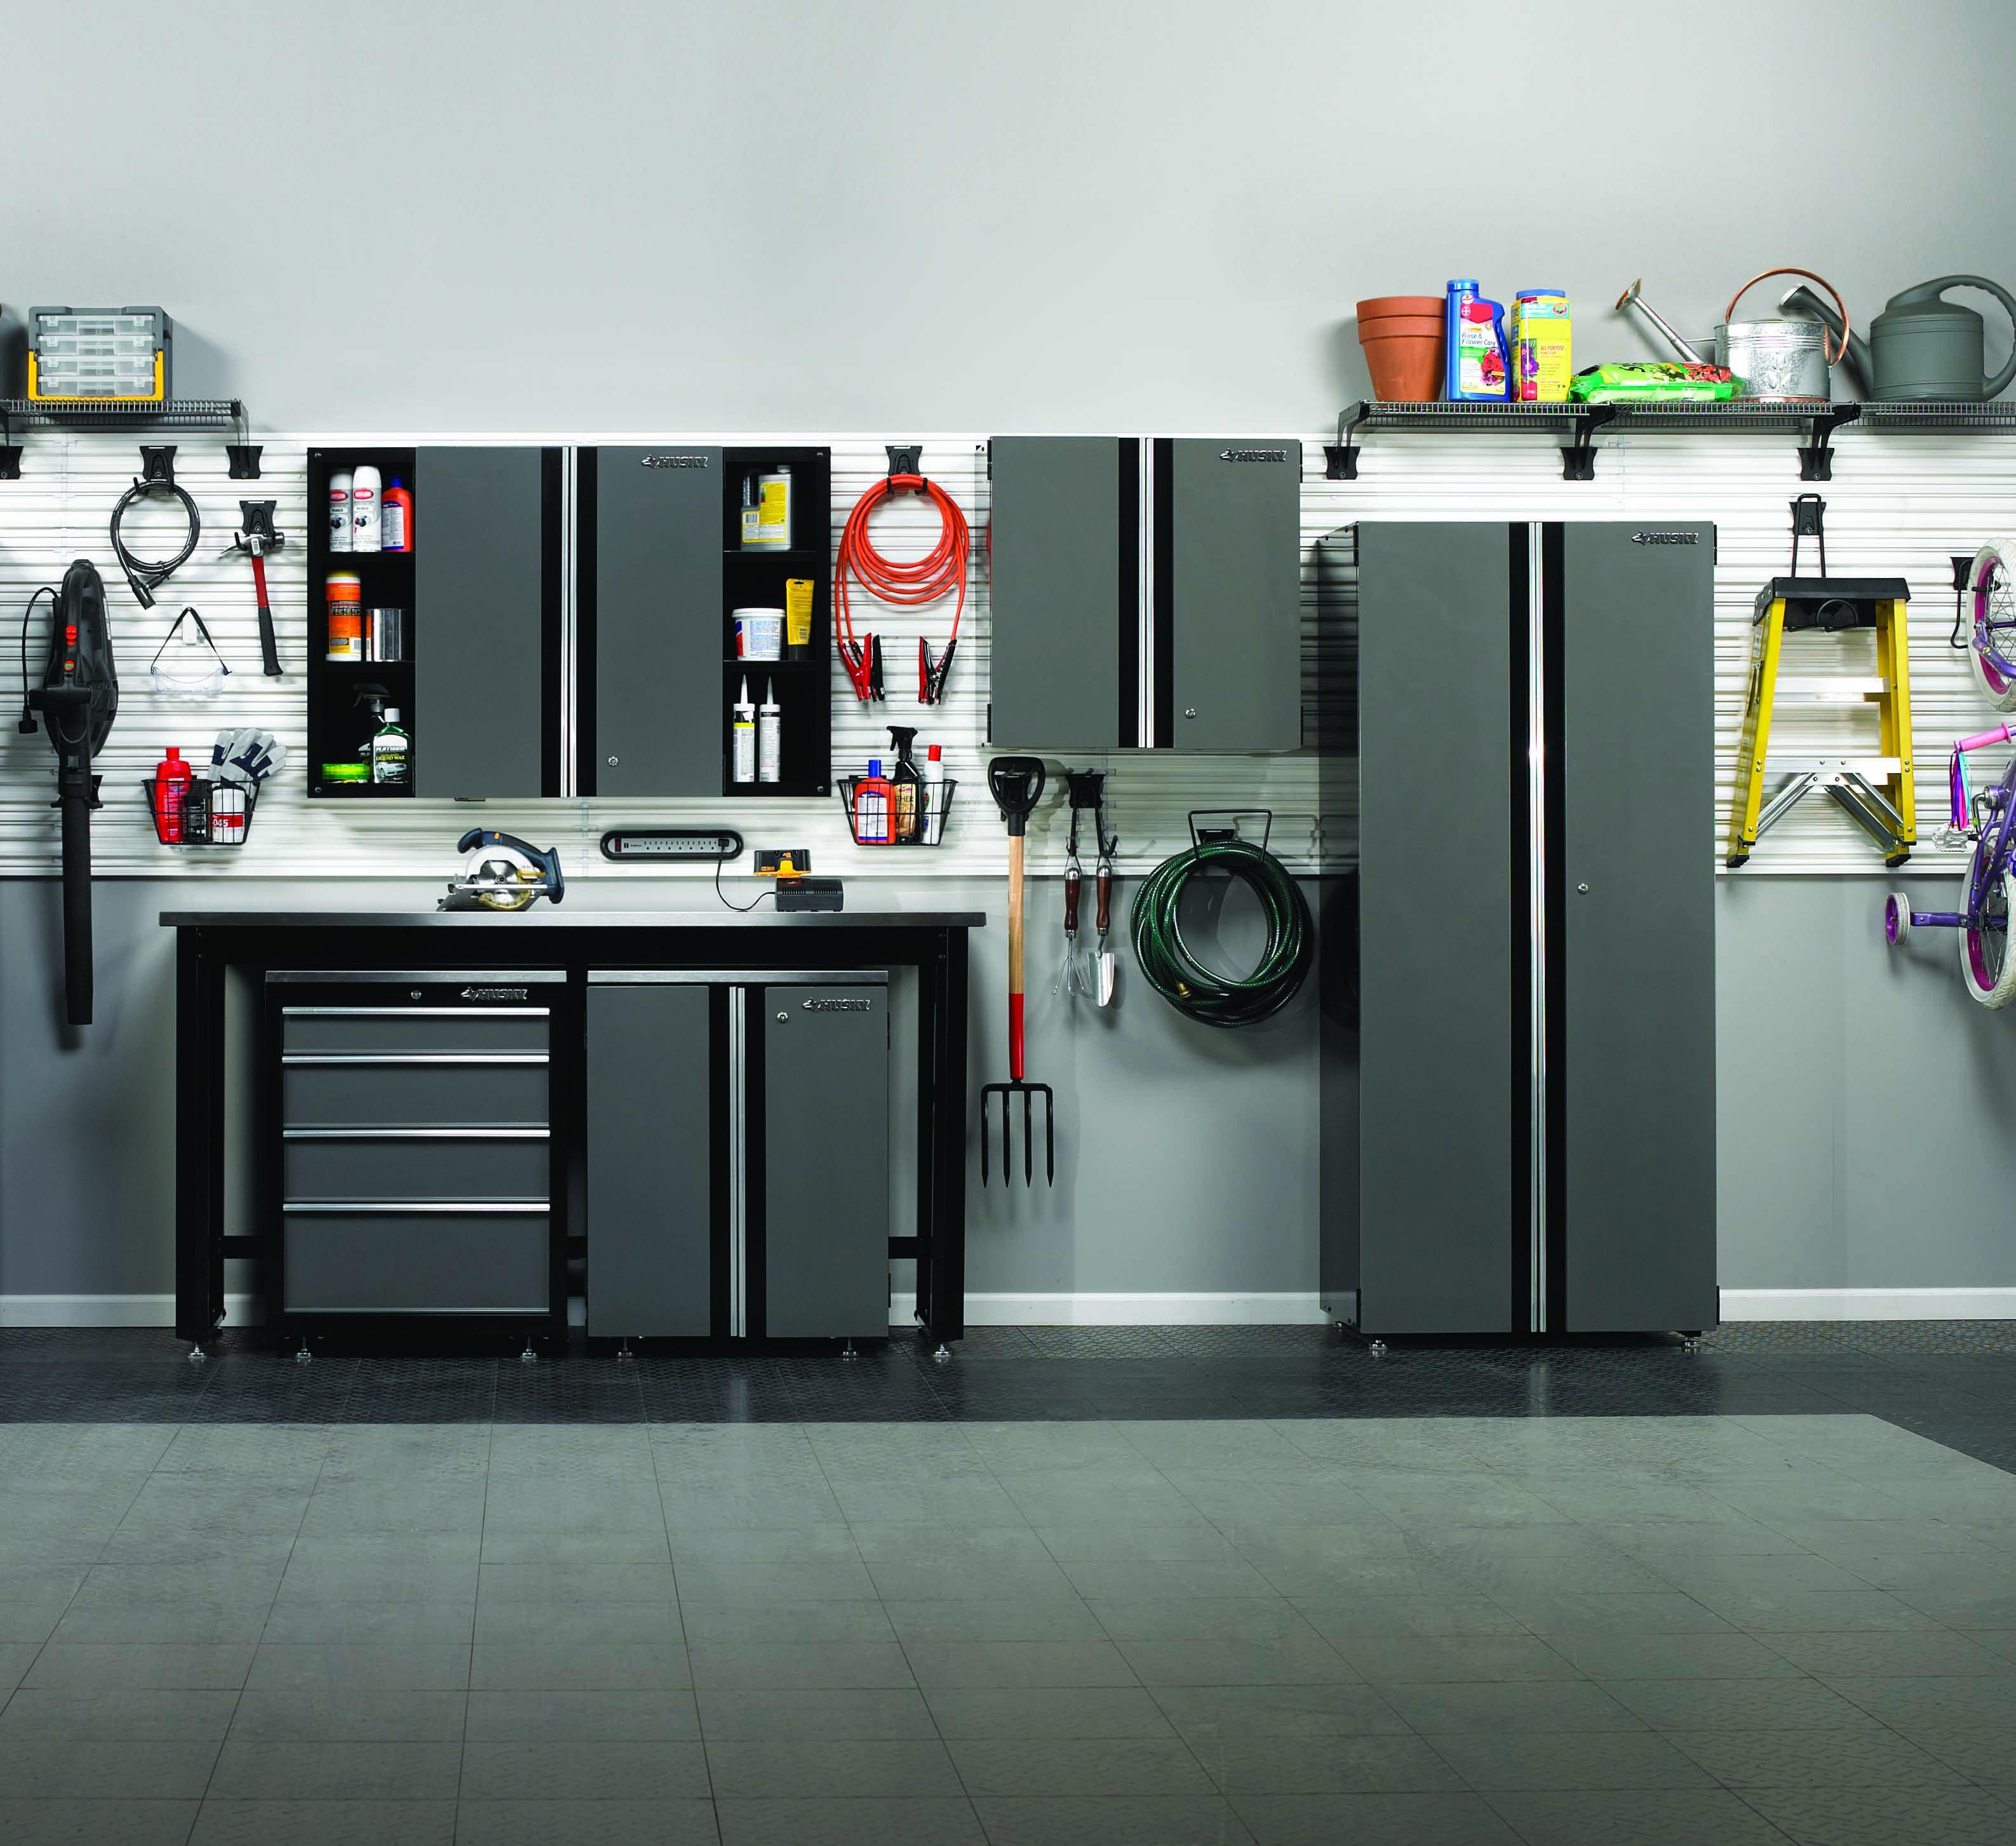 Dreaming Of An Organized Garage Husky Tool Storage Has You